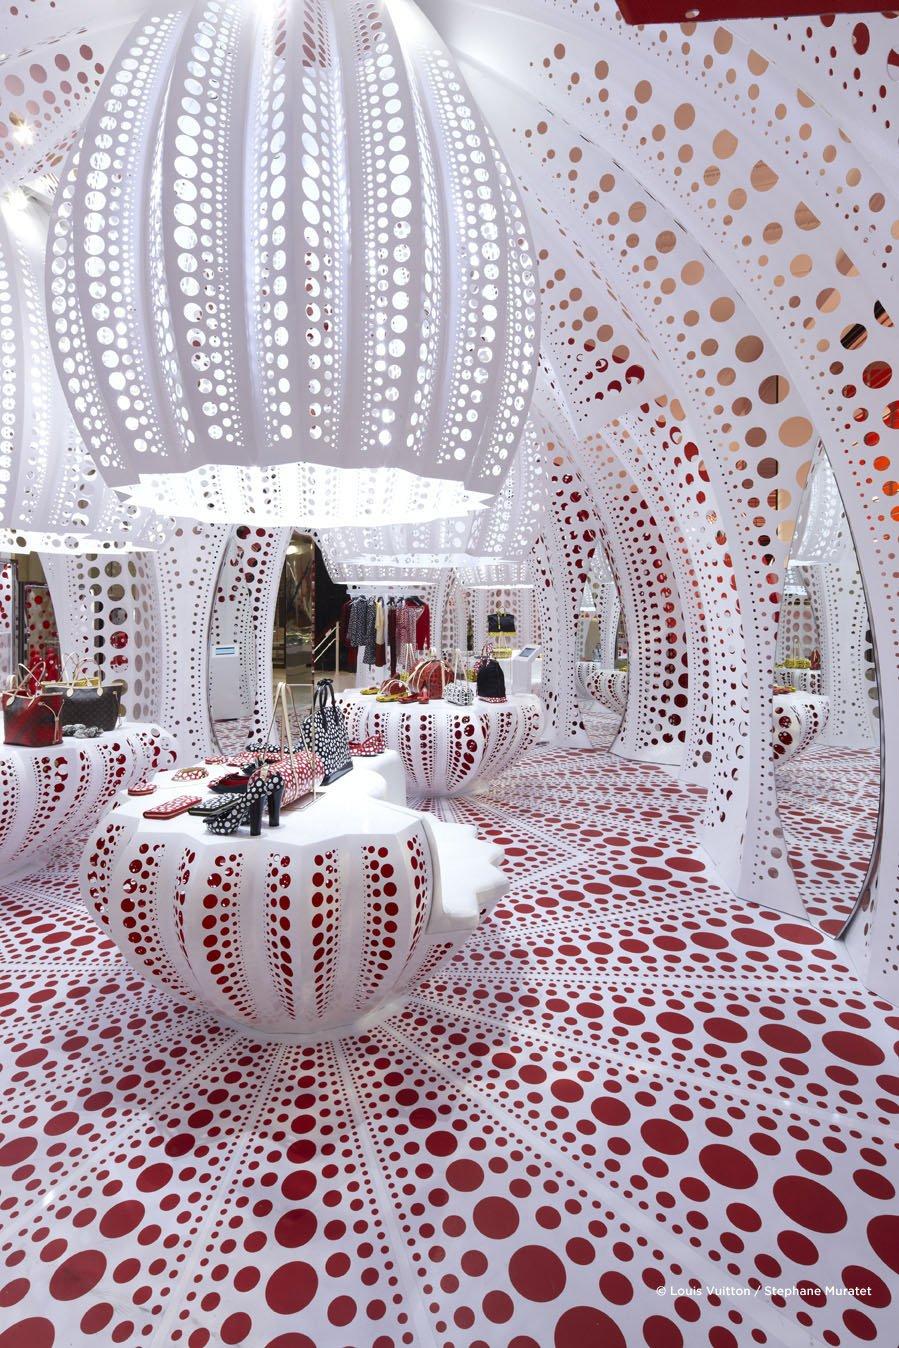 Дизайн магазина Louis Vuitton от Yayoi Kusama, Лондон